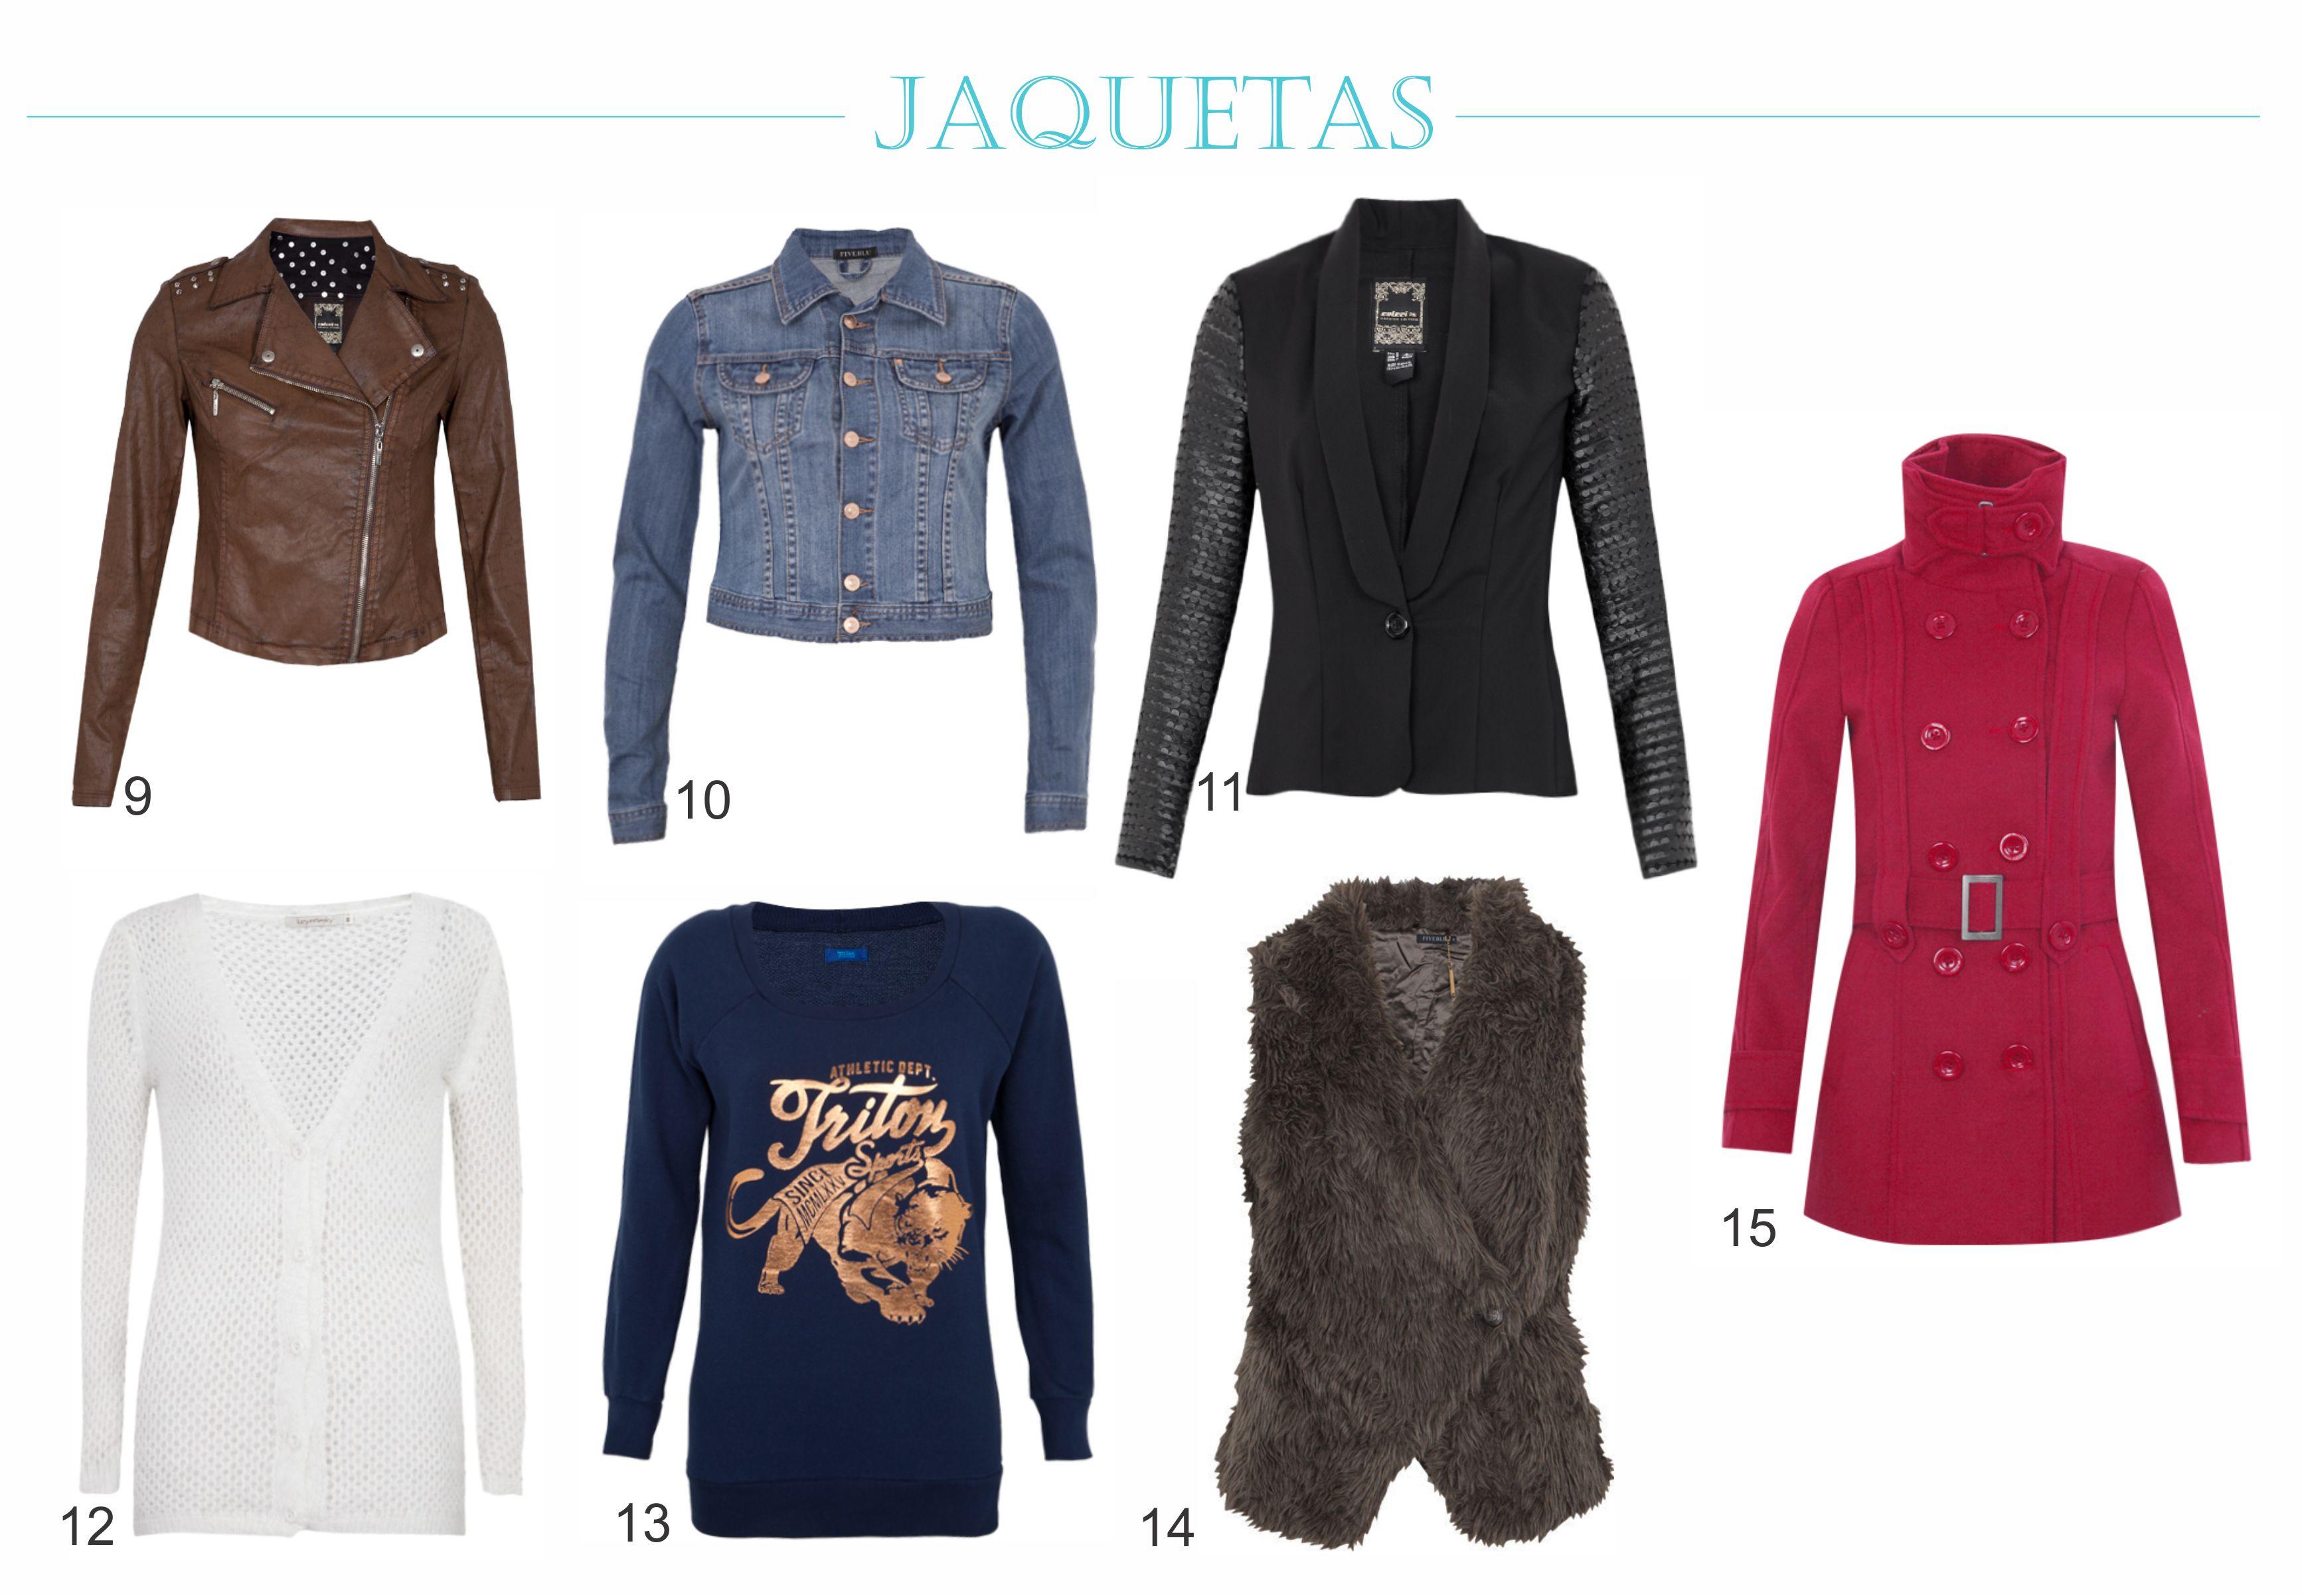 jaquetas_o_que_toda_mulher_precisa_ter_no_guarda_roupa_sos_solteiros